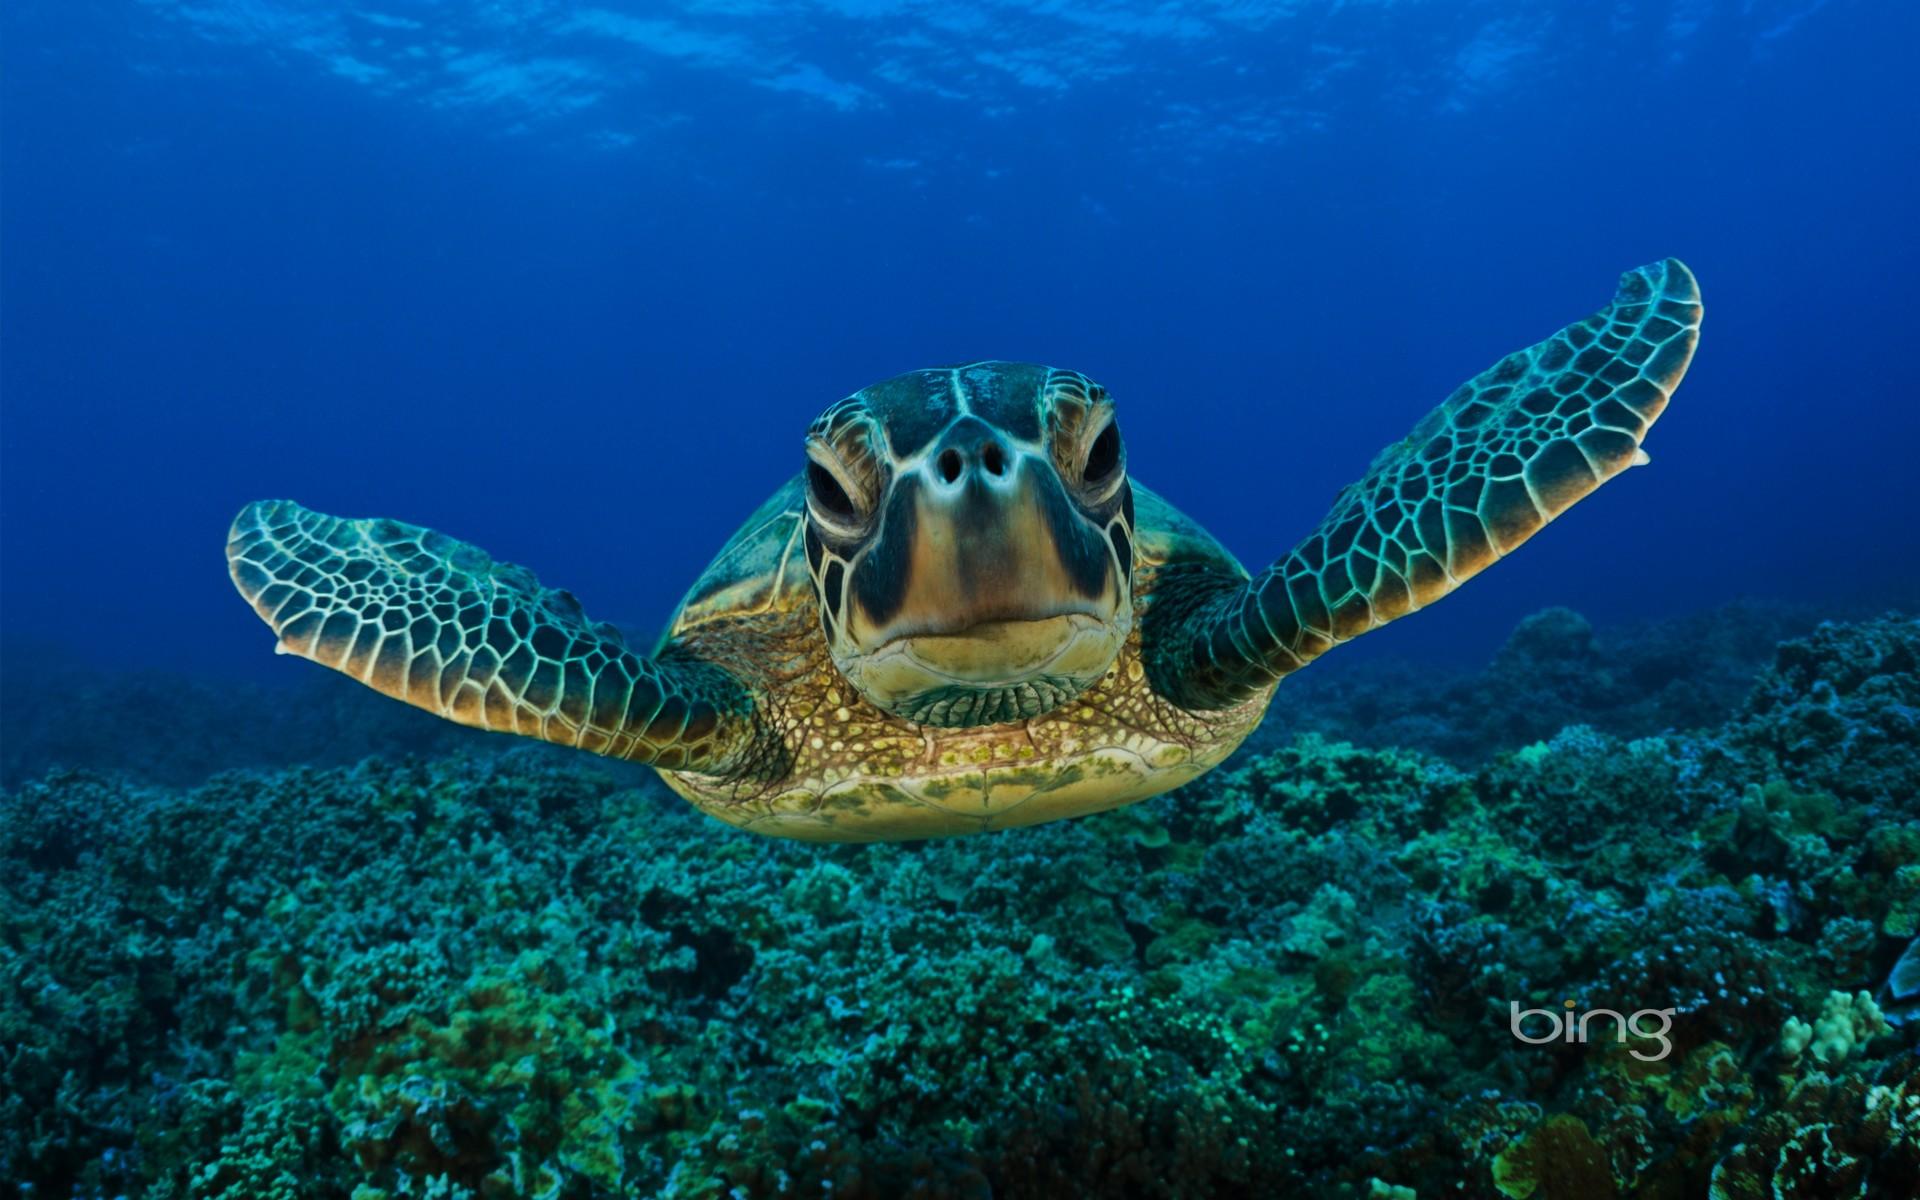 General 1920x1200 underwater turtle animals sea swimming diving Bing